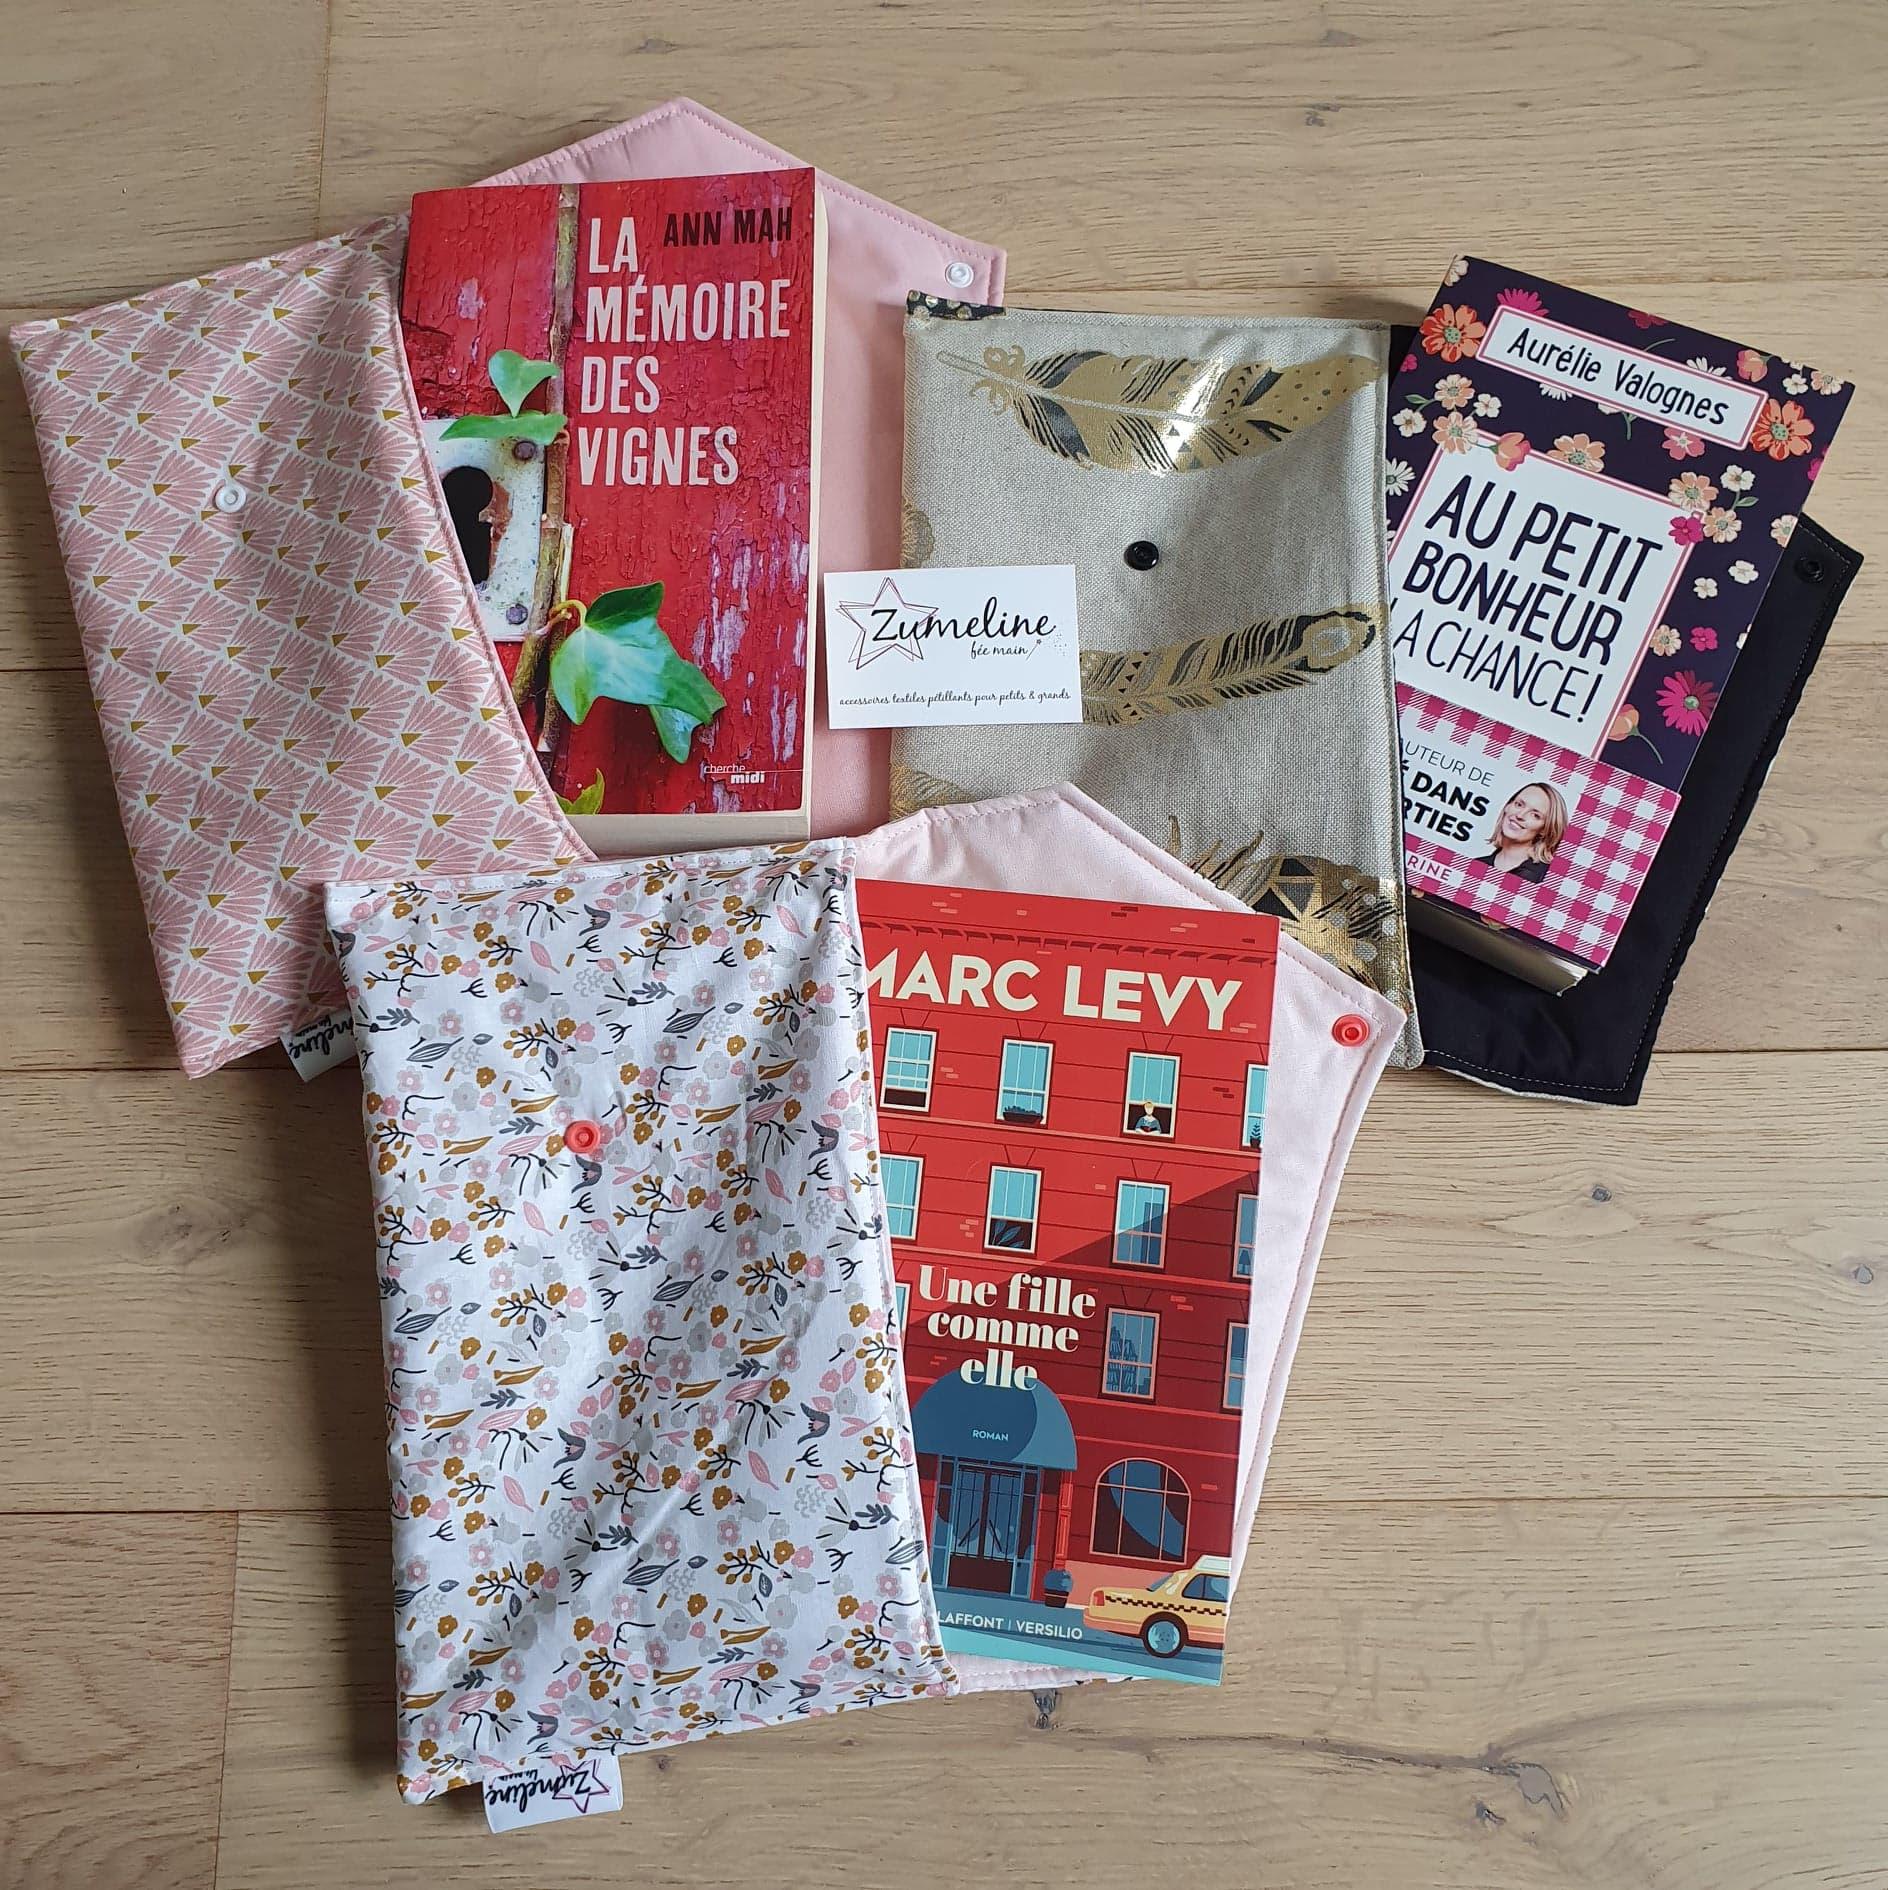 anaisw-zumeline-pochettes-livres-broches